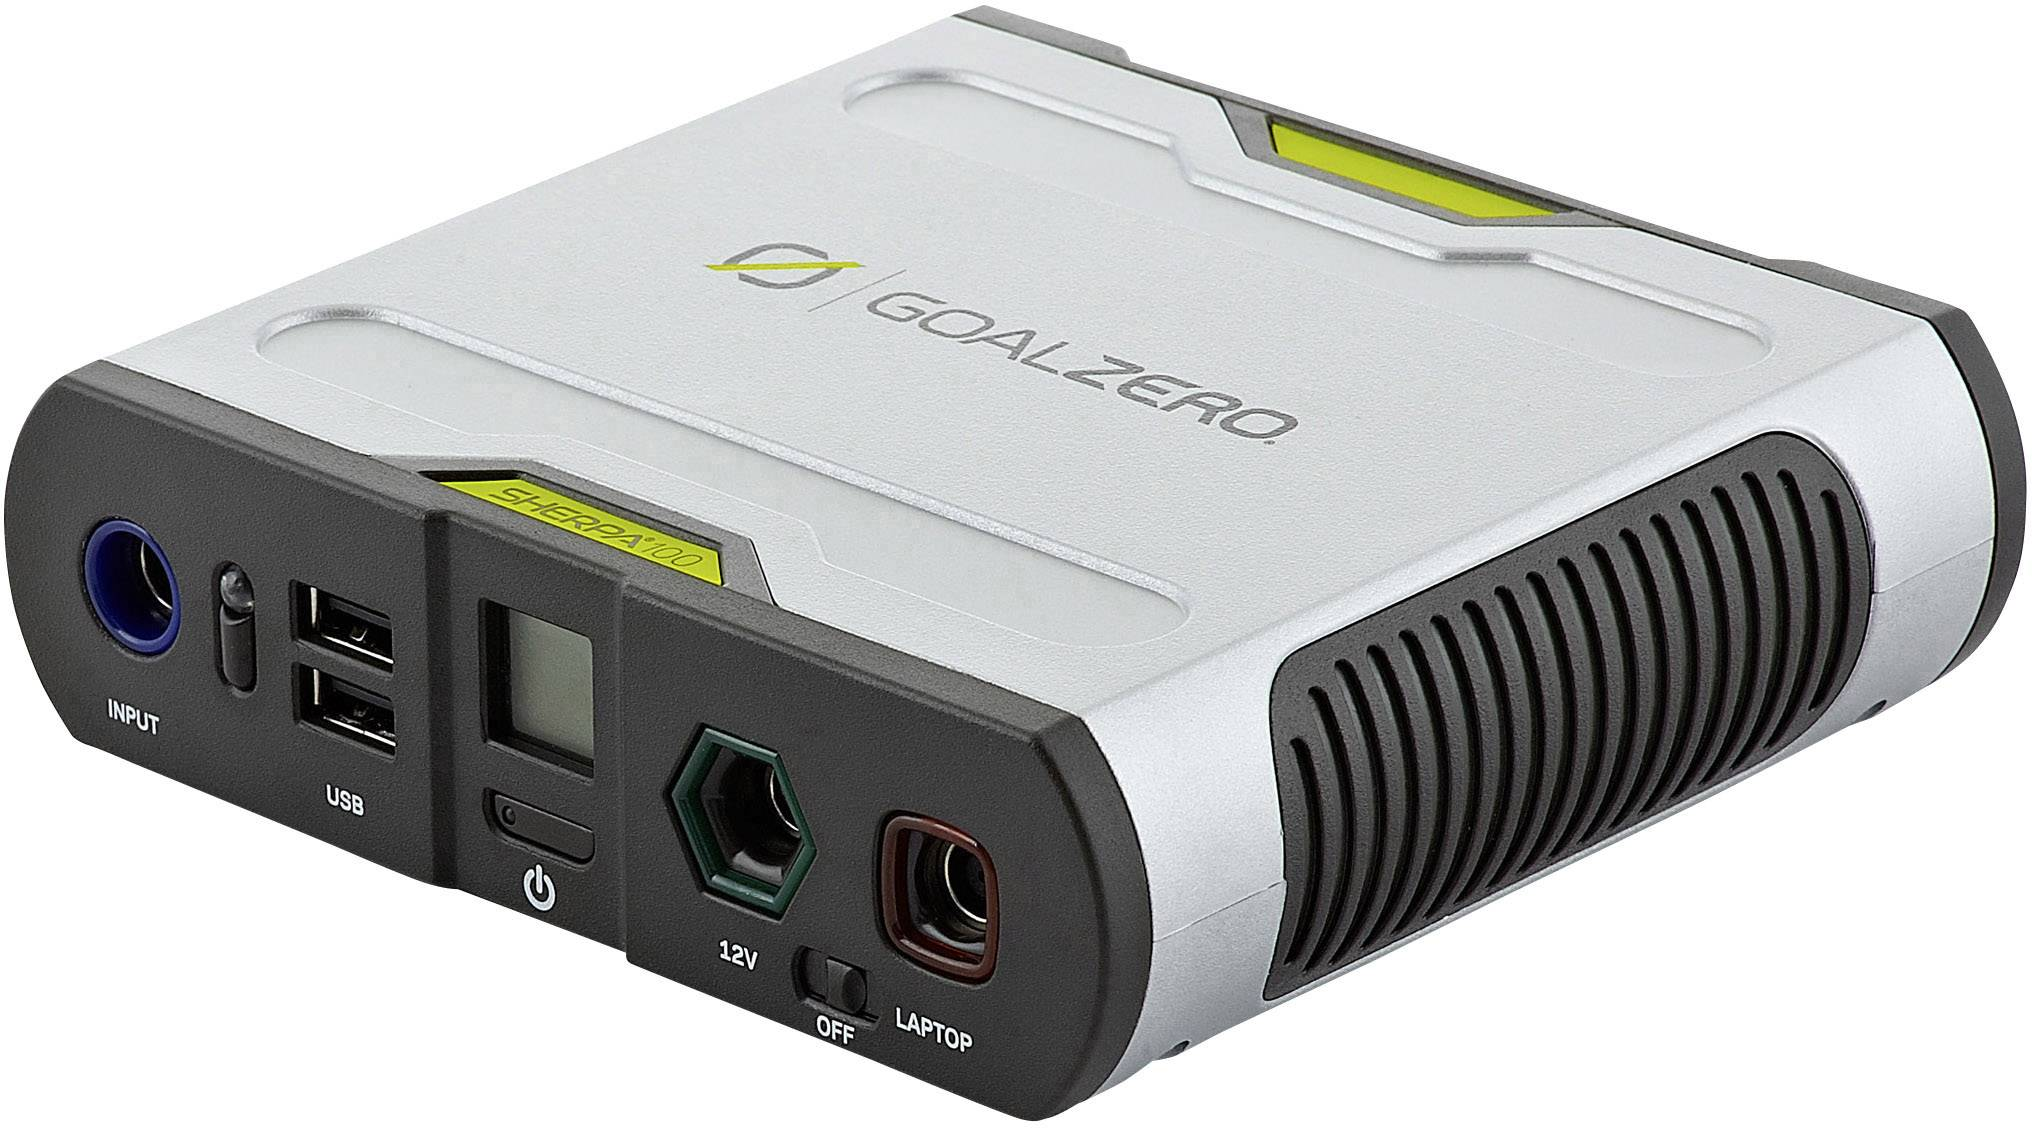 Powerbanka Goal Zero Sherpa 100 Recharger 98 Wh, Li-Ion akumulátor 26400 mAh, stříbrná